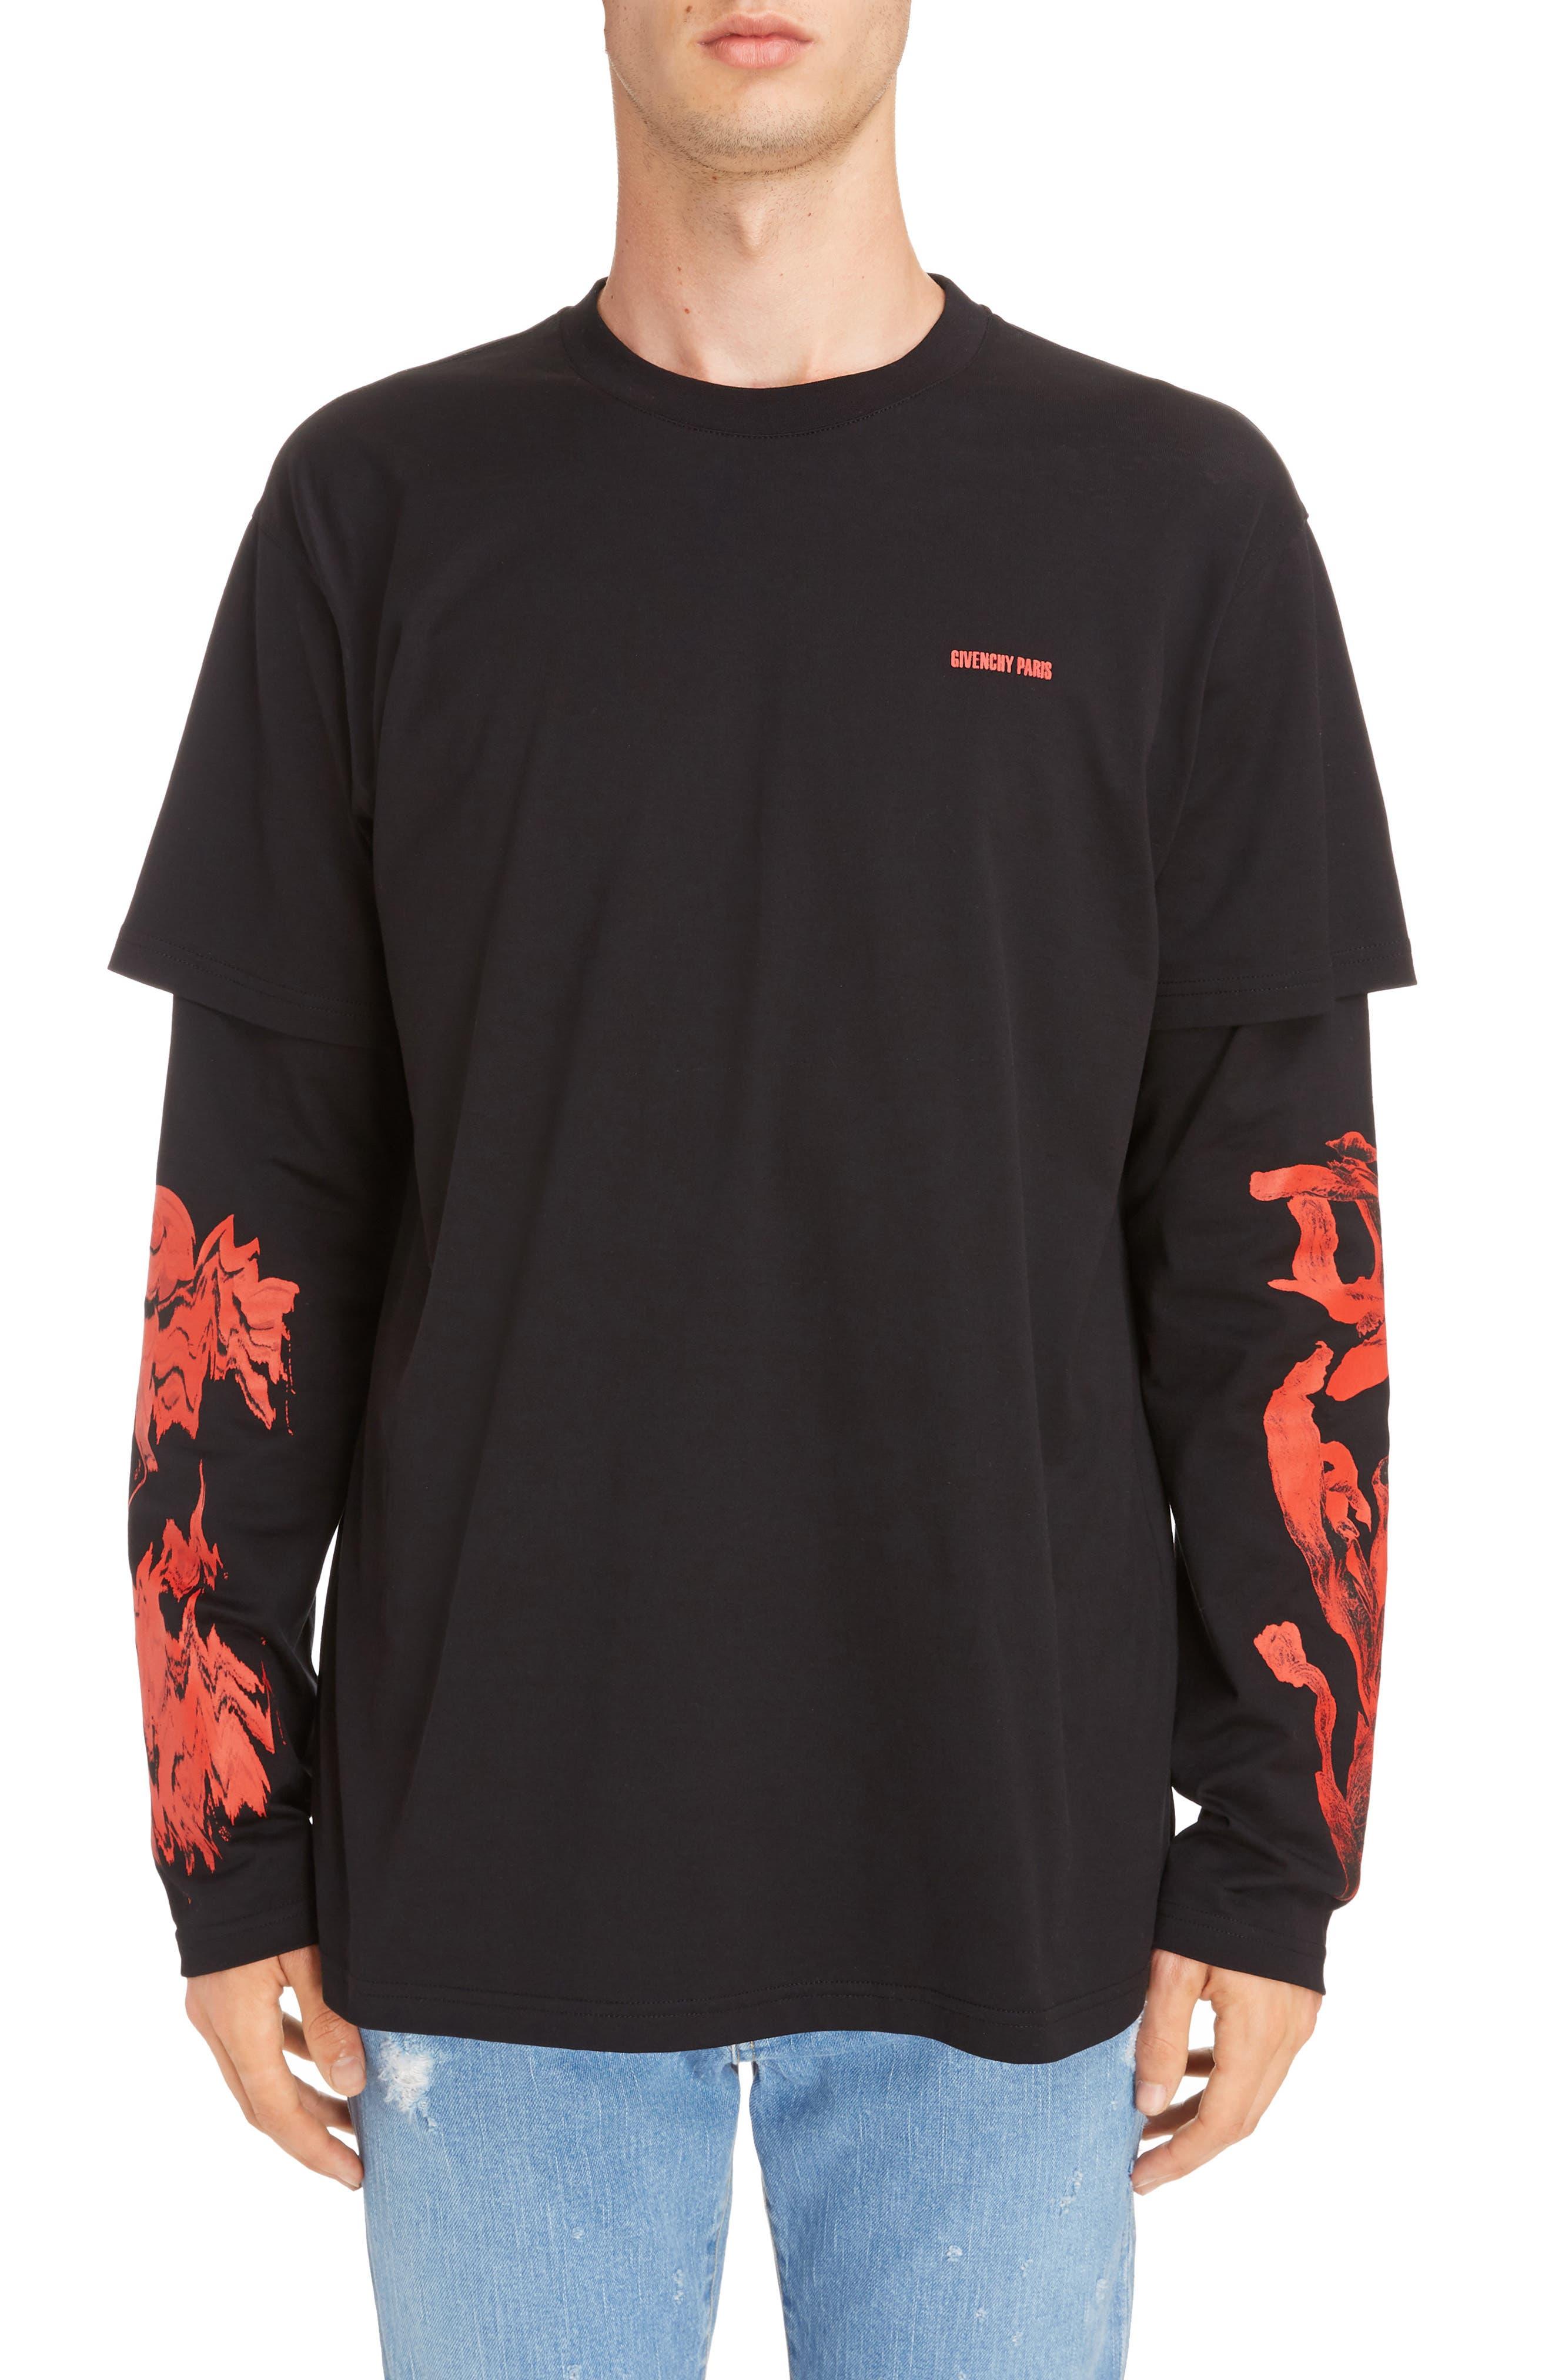 Alternate Image 1 Selected - Givenchy Rose Print Long Sleeve T-Shirt